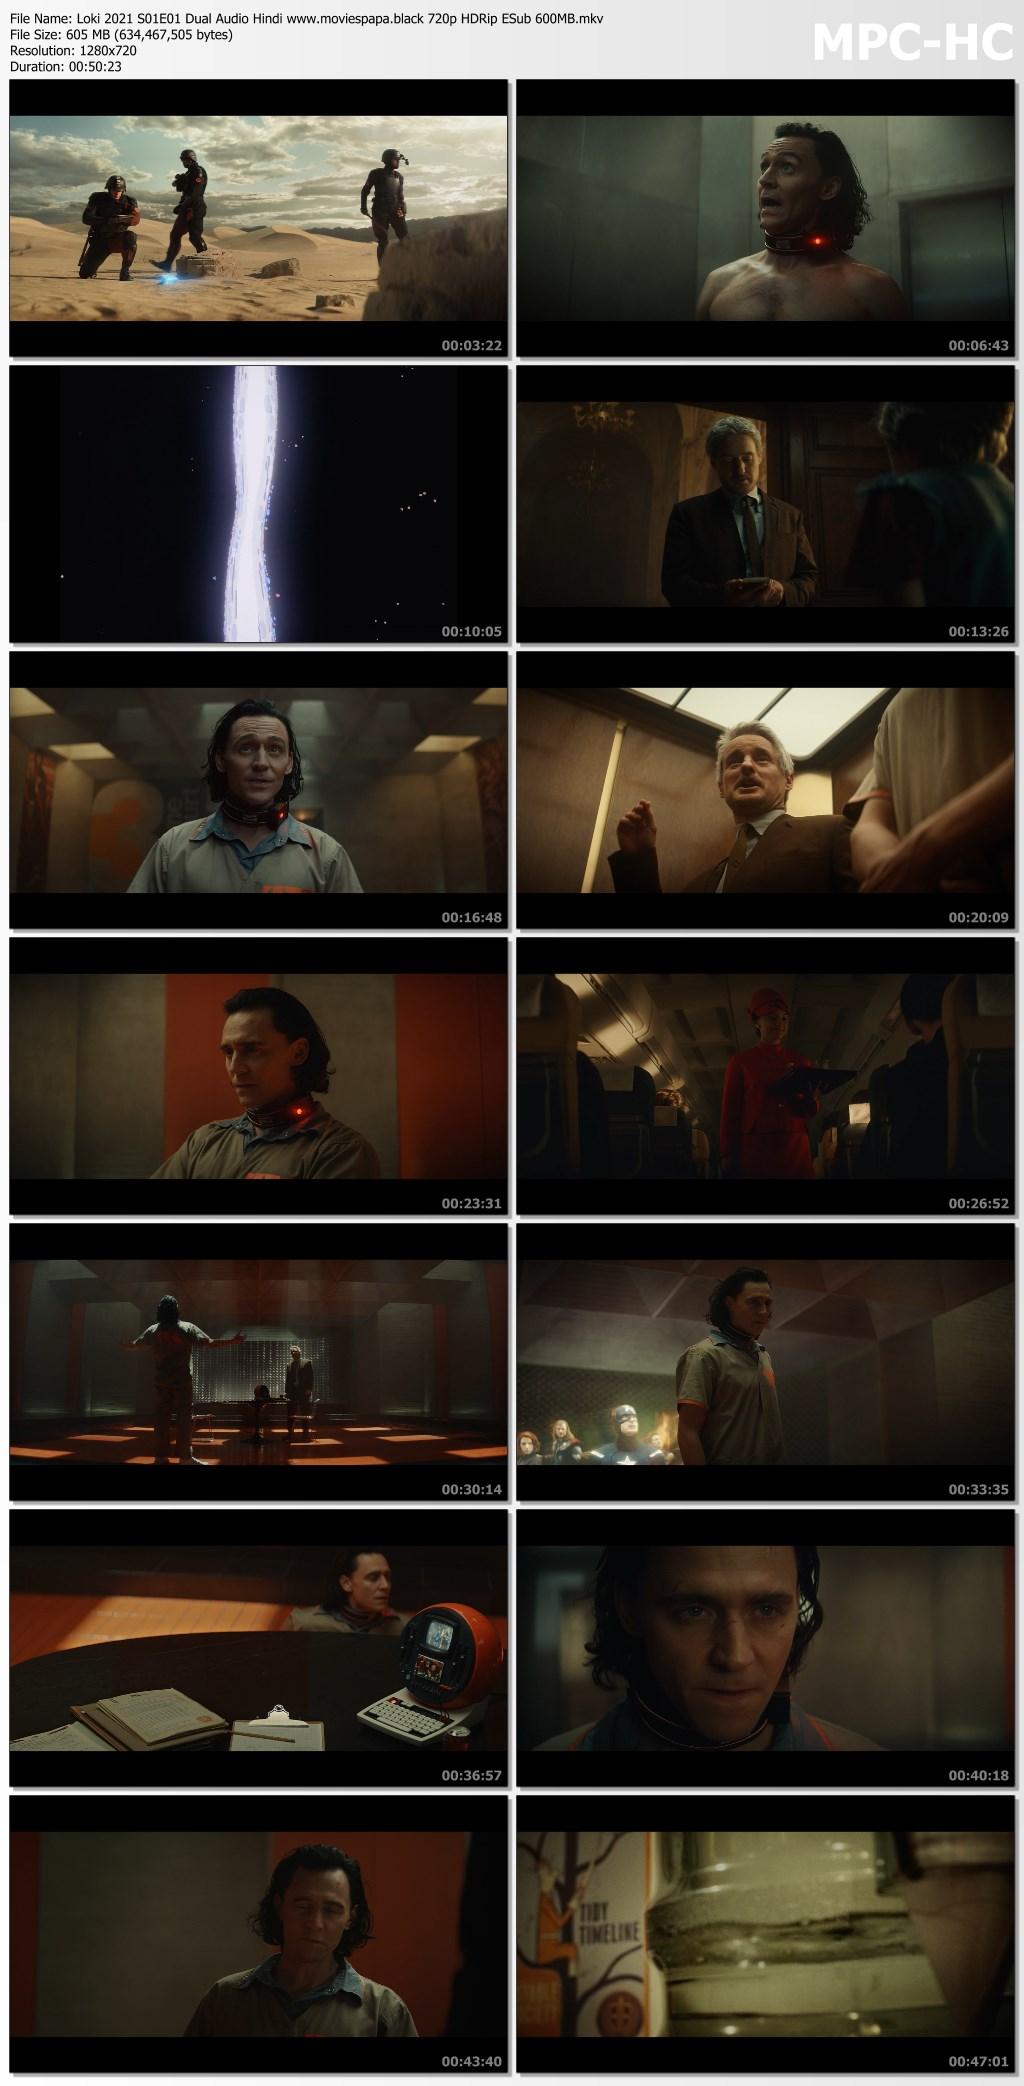 Loki 2021 screenshot HDMoviesFair